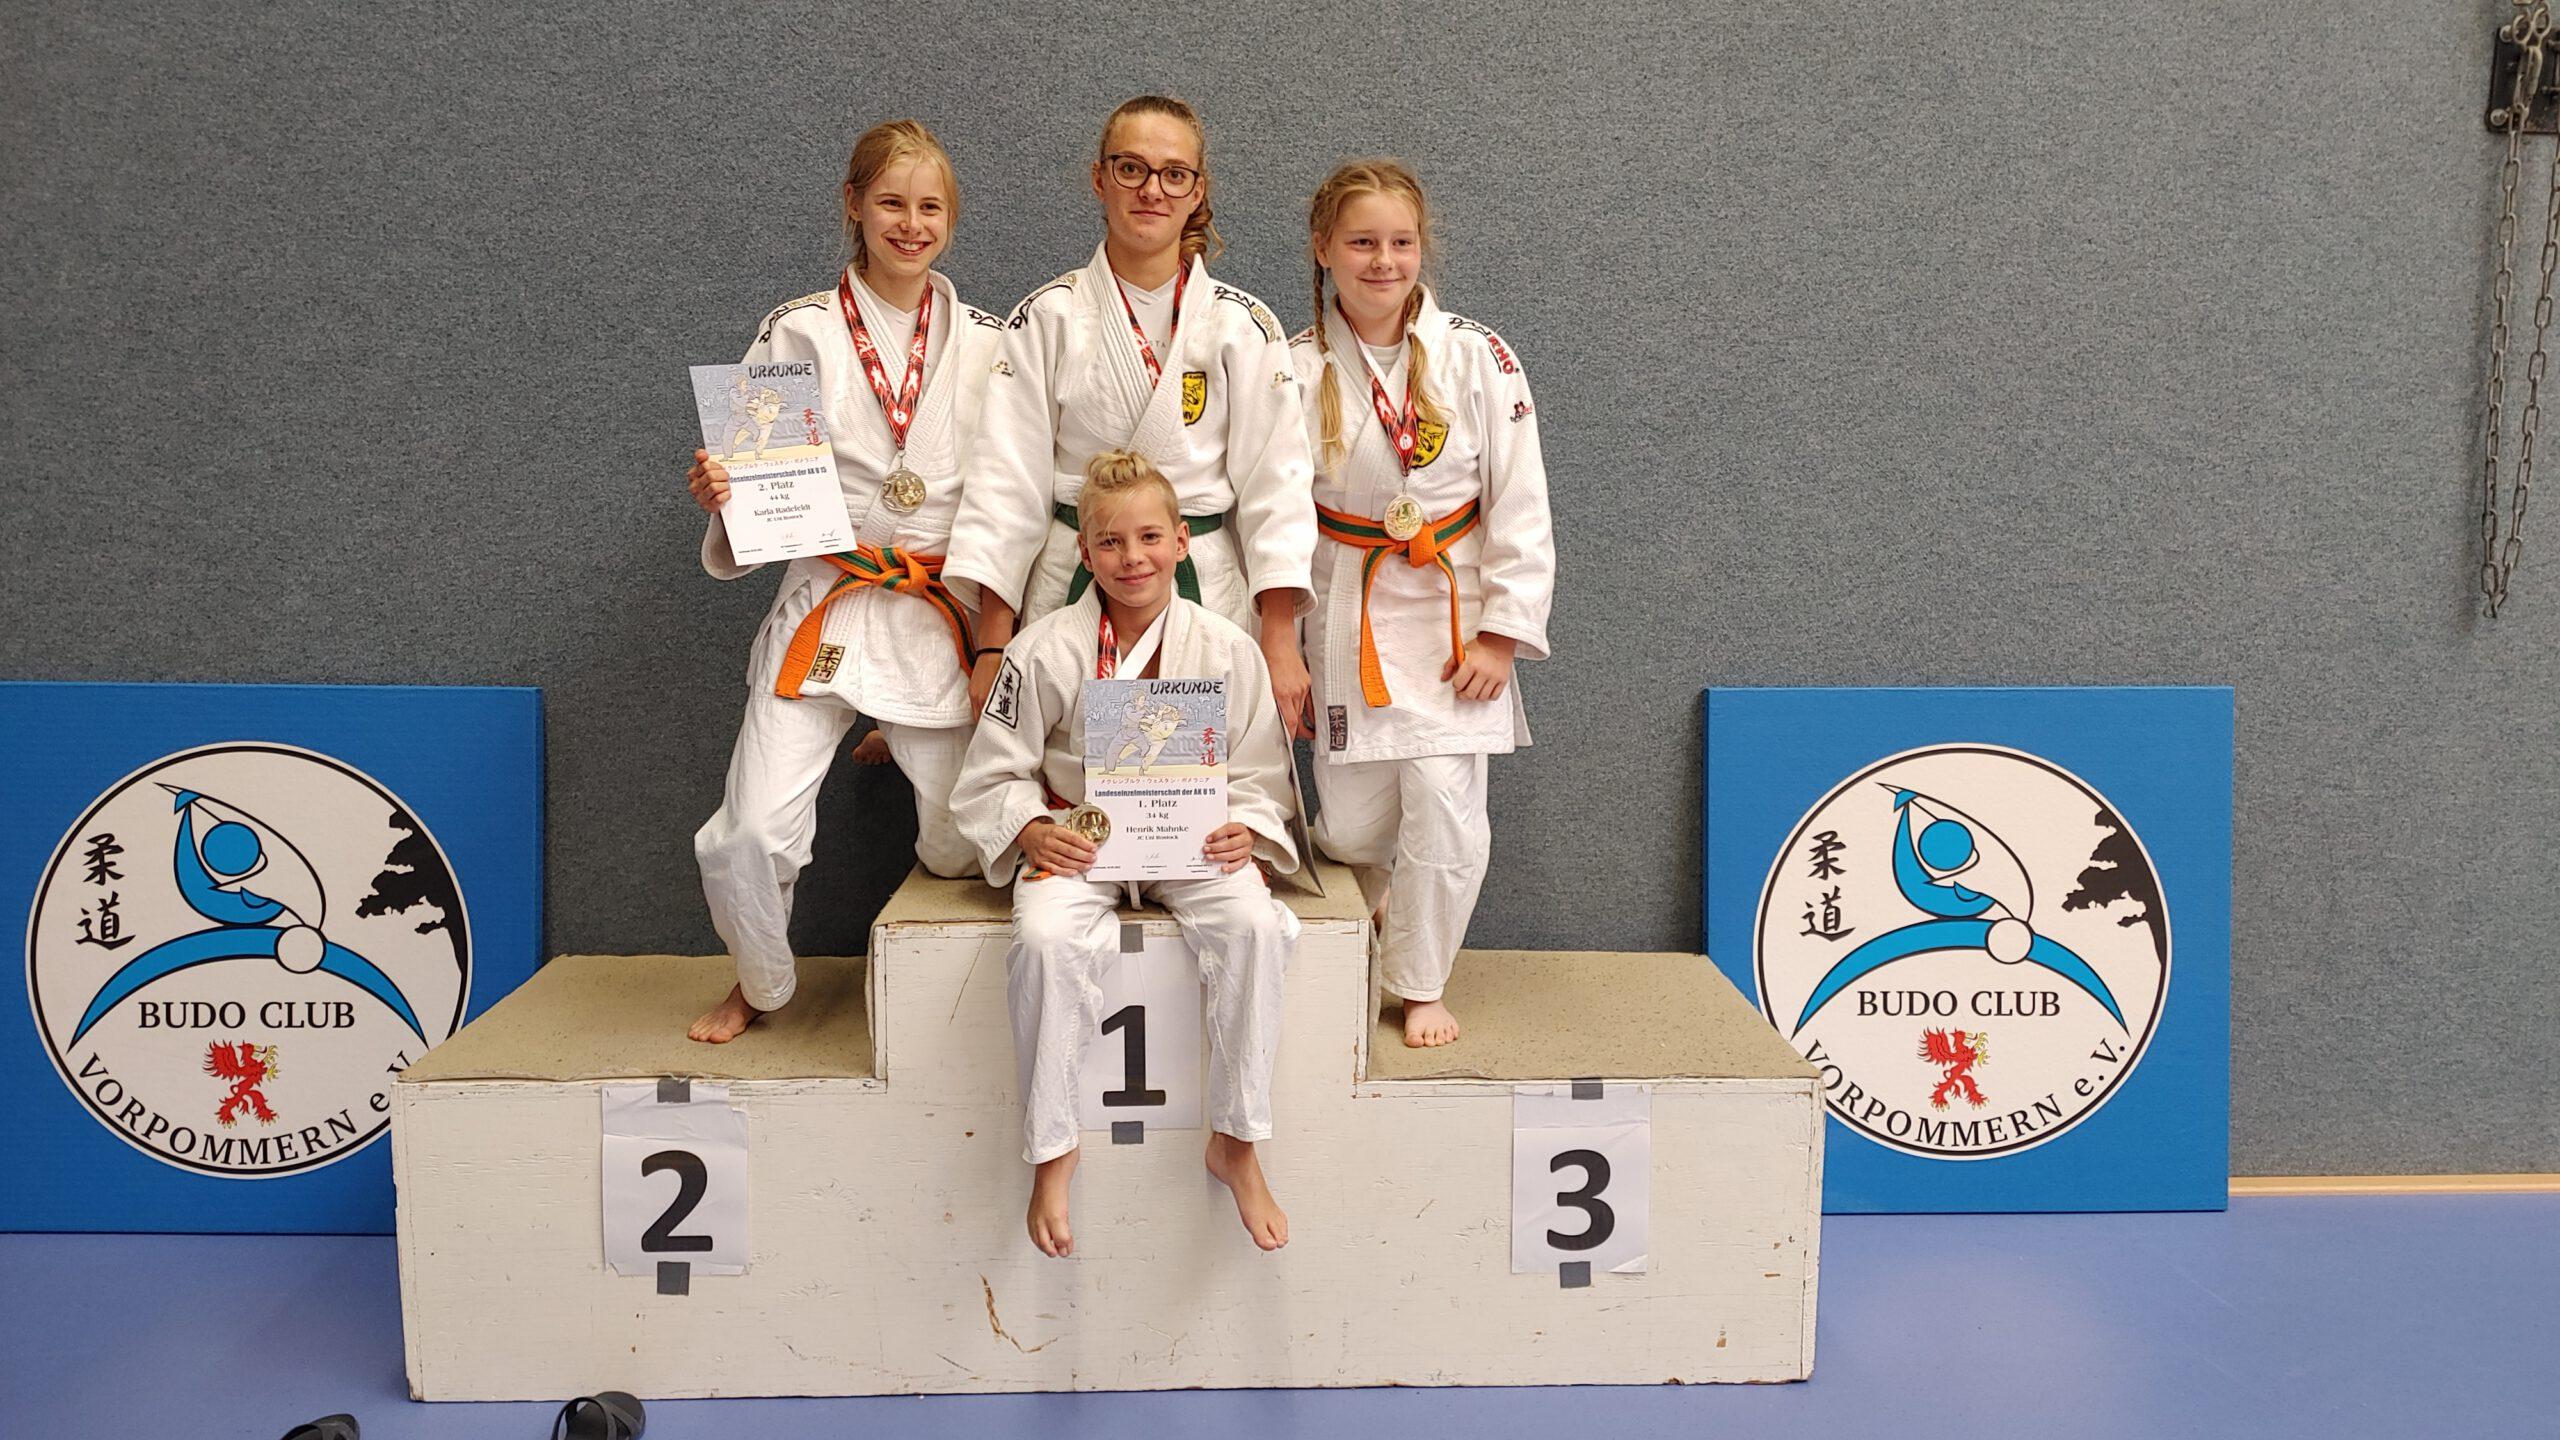 LEM U15 Greifswald 2021 Siegerehrung 6 Judogreifen - Judo Rostock